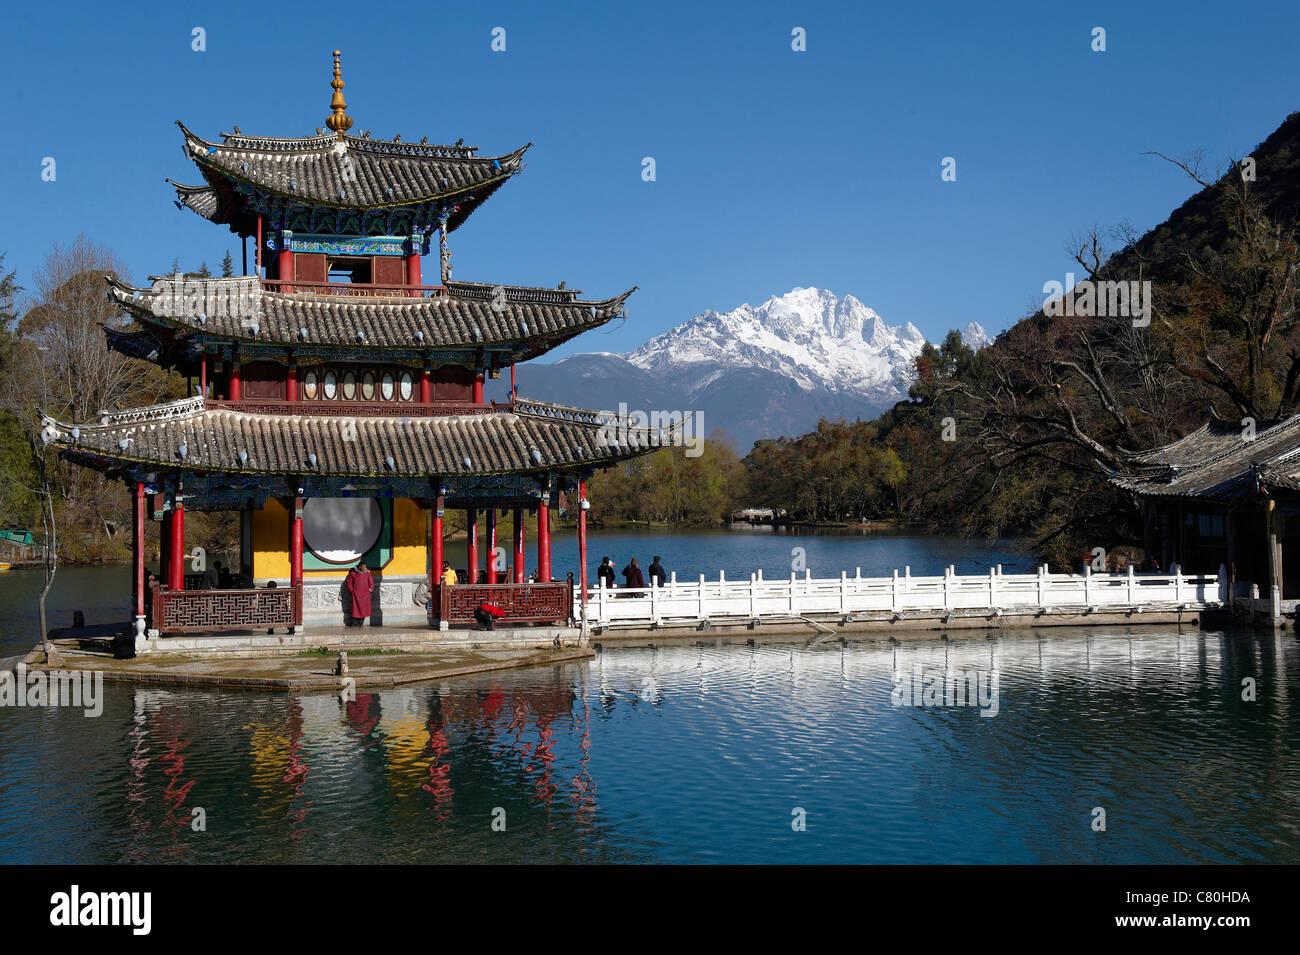 China, Yunnan, Lijiang, Black Dragon pool, background the Jade Dragon snow mountain - Stock Image